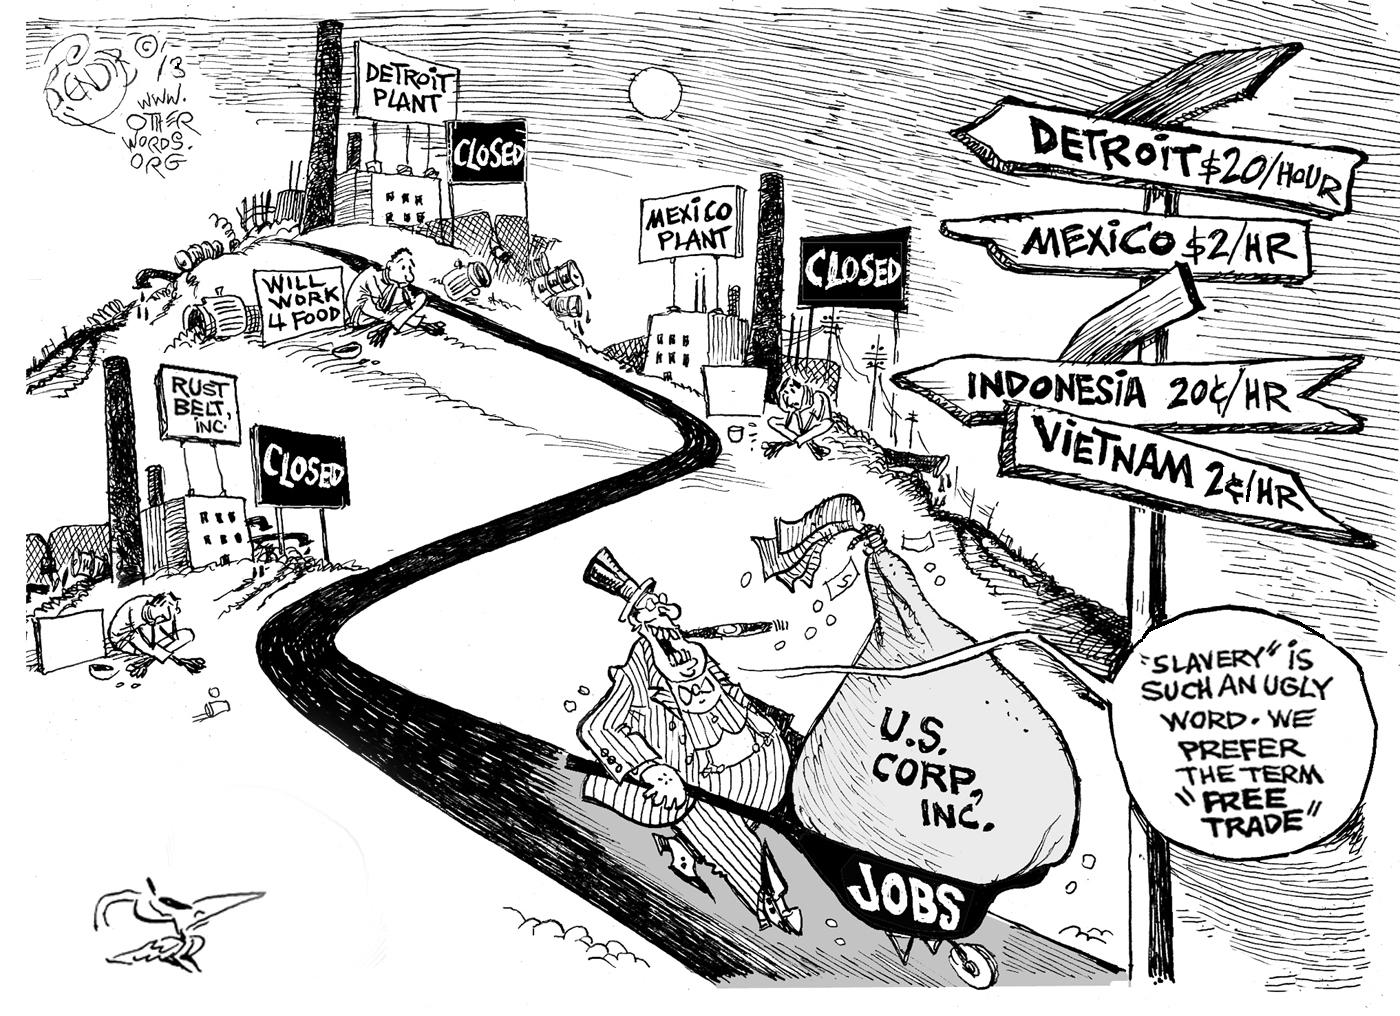 Free Trade Economics 101